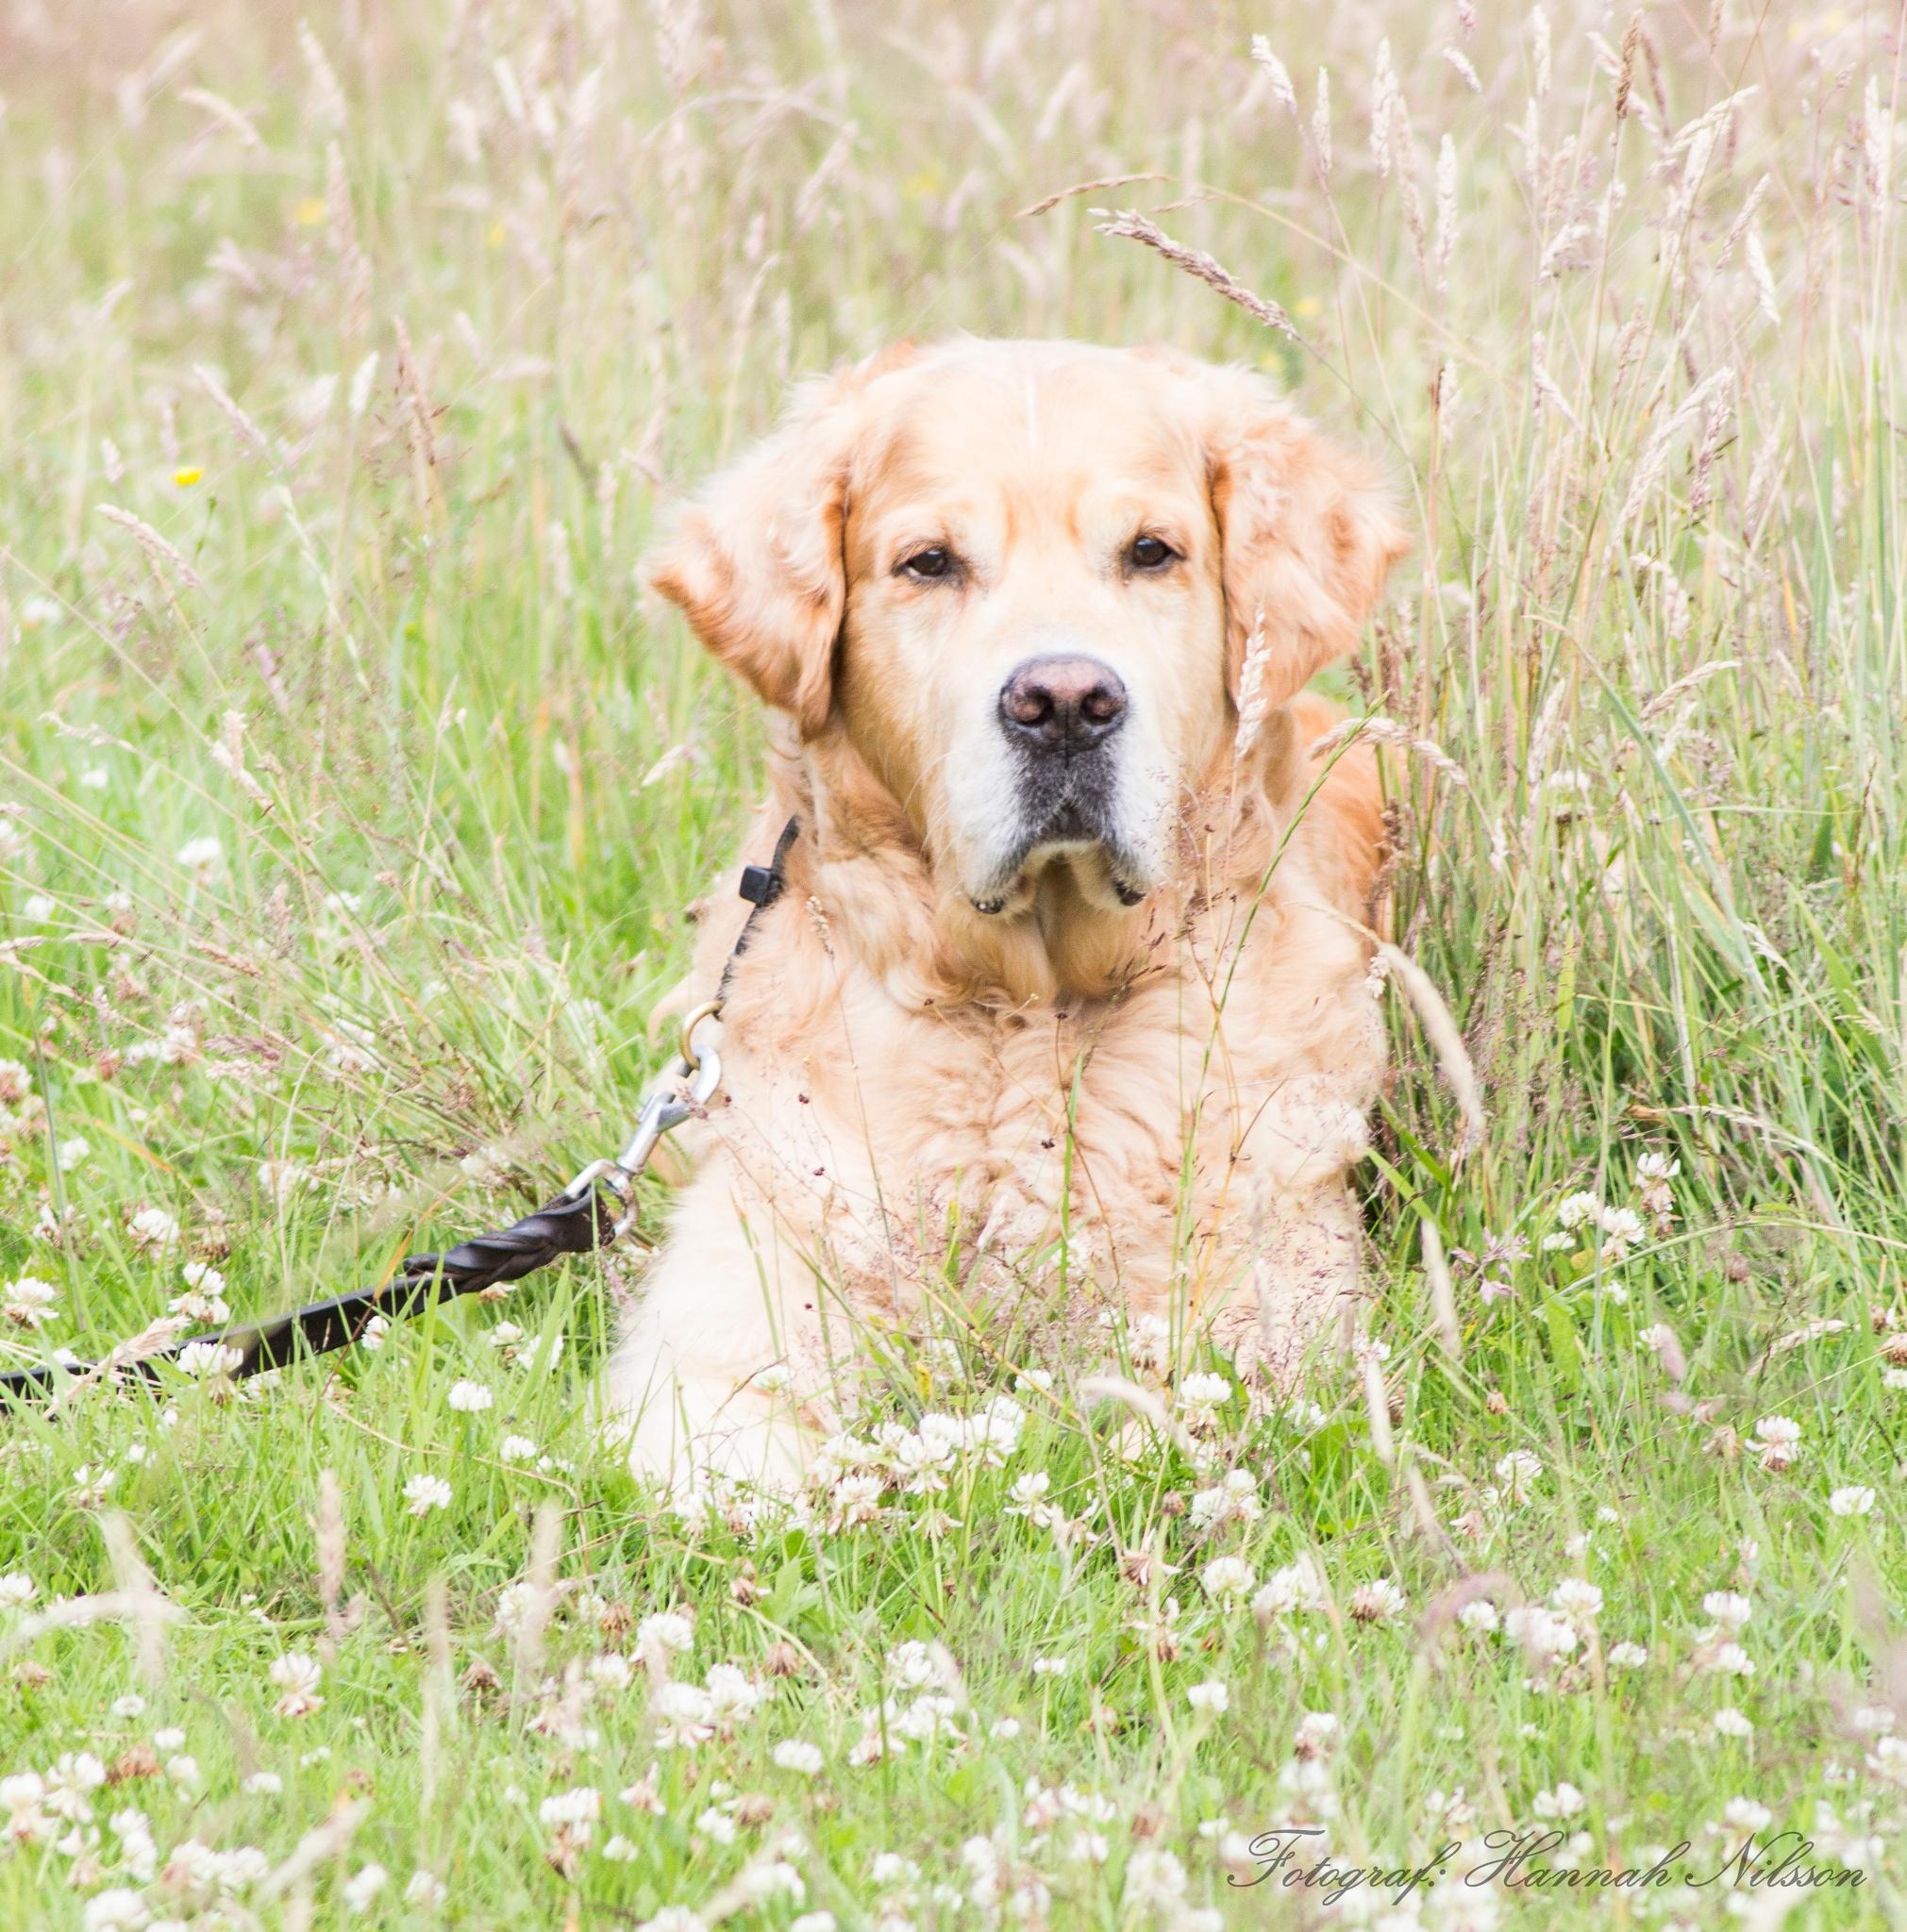 Dog by Hnilssonphoto